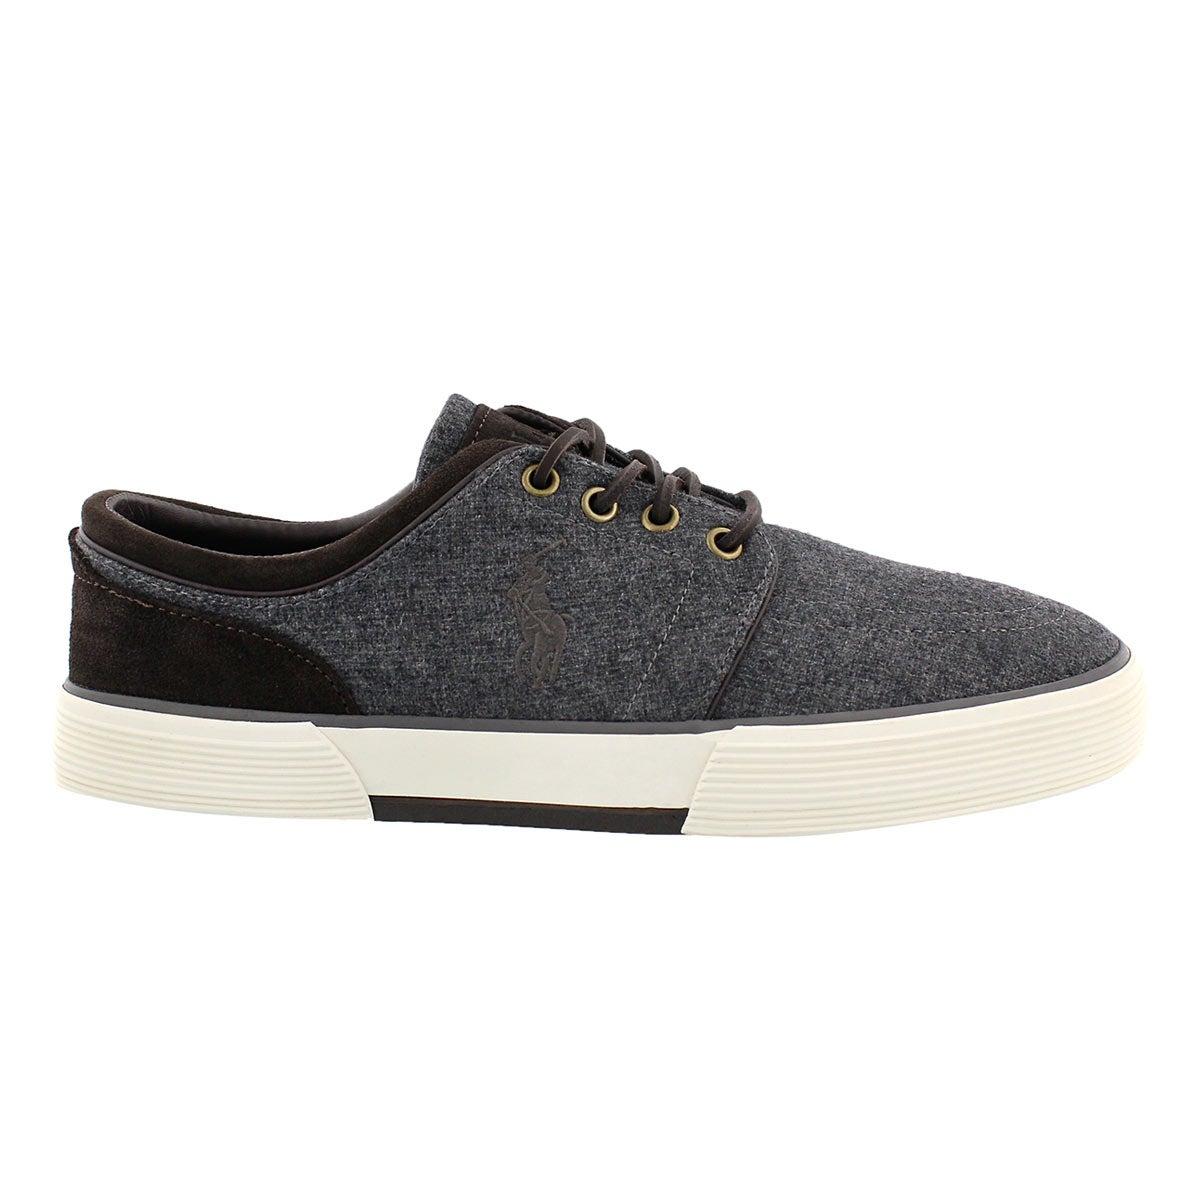 Mns Faxon Low gry/brn lace up sneaker